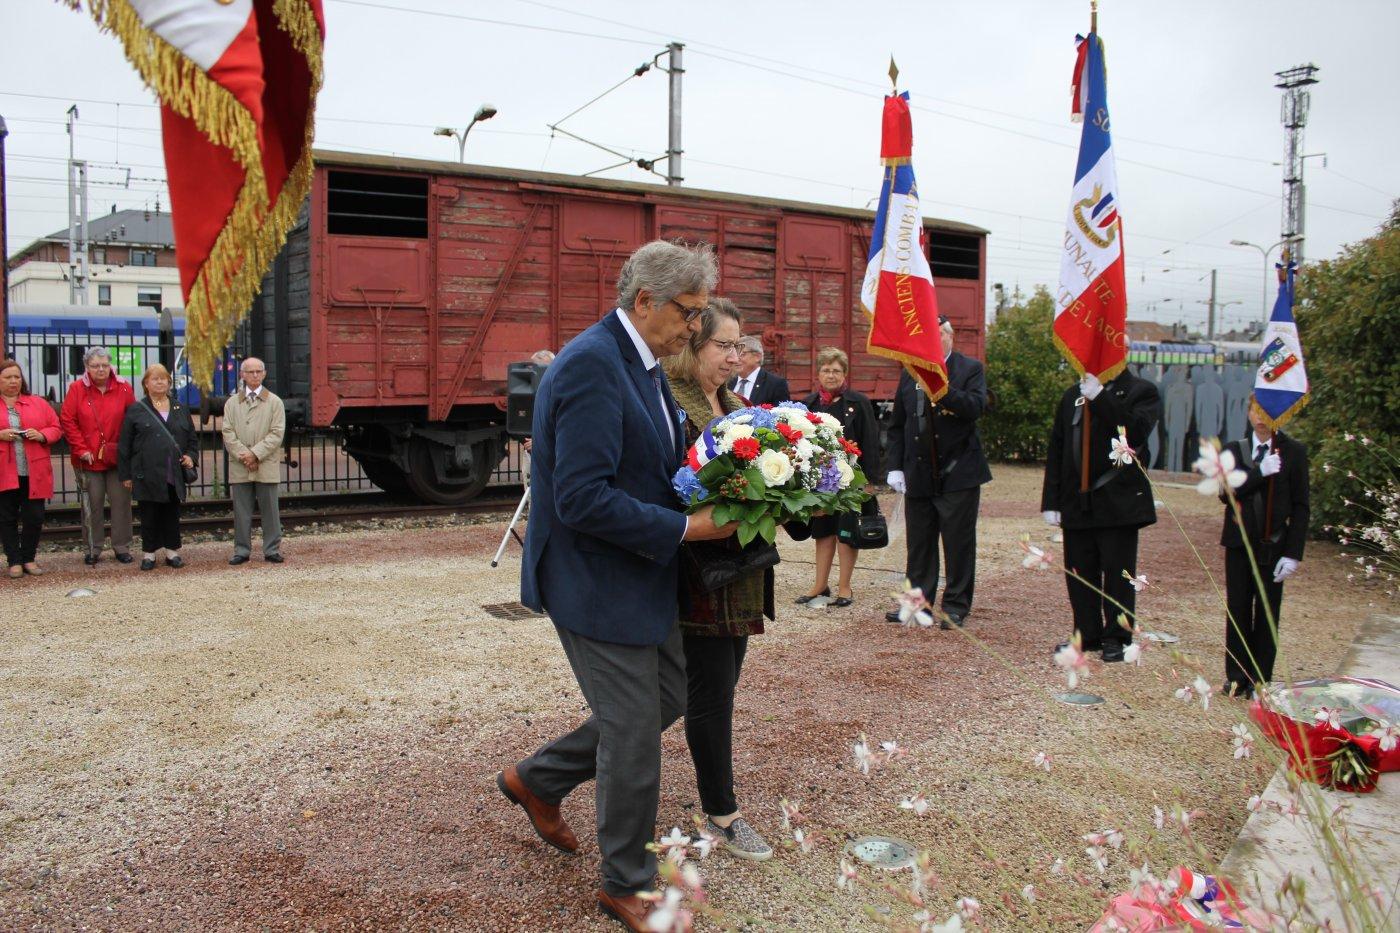 memorial-du-wagon-de-deportation-ceremonie-du-train-de-mort-2-juillet-2017